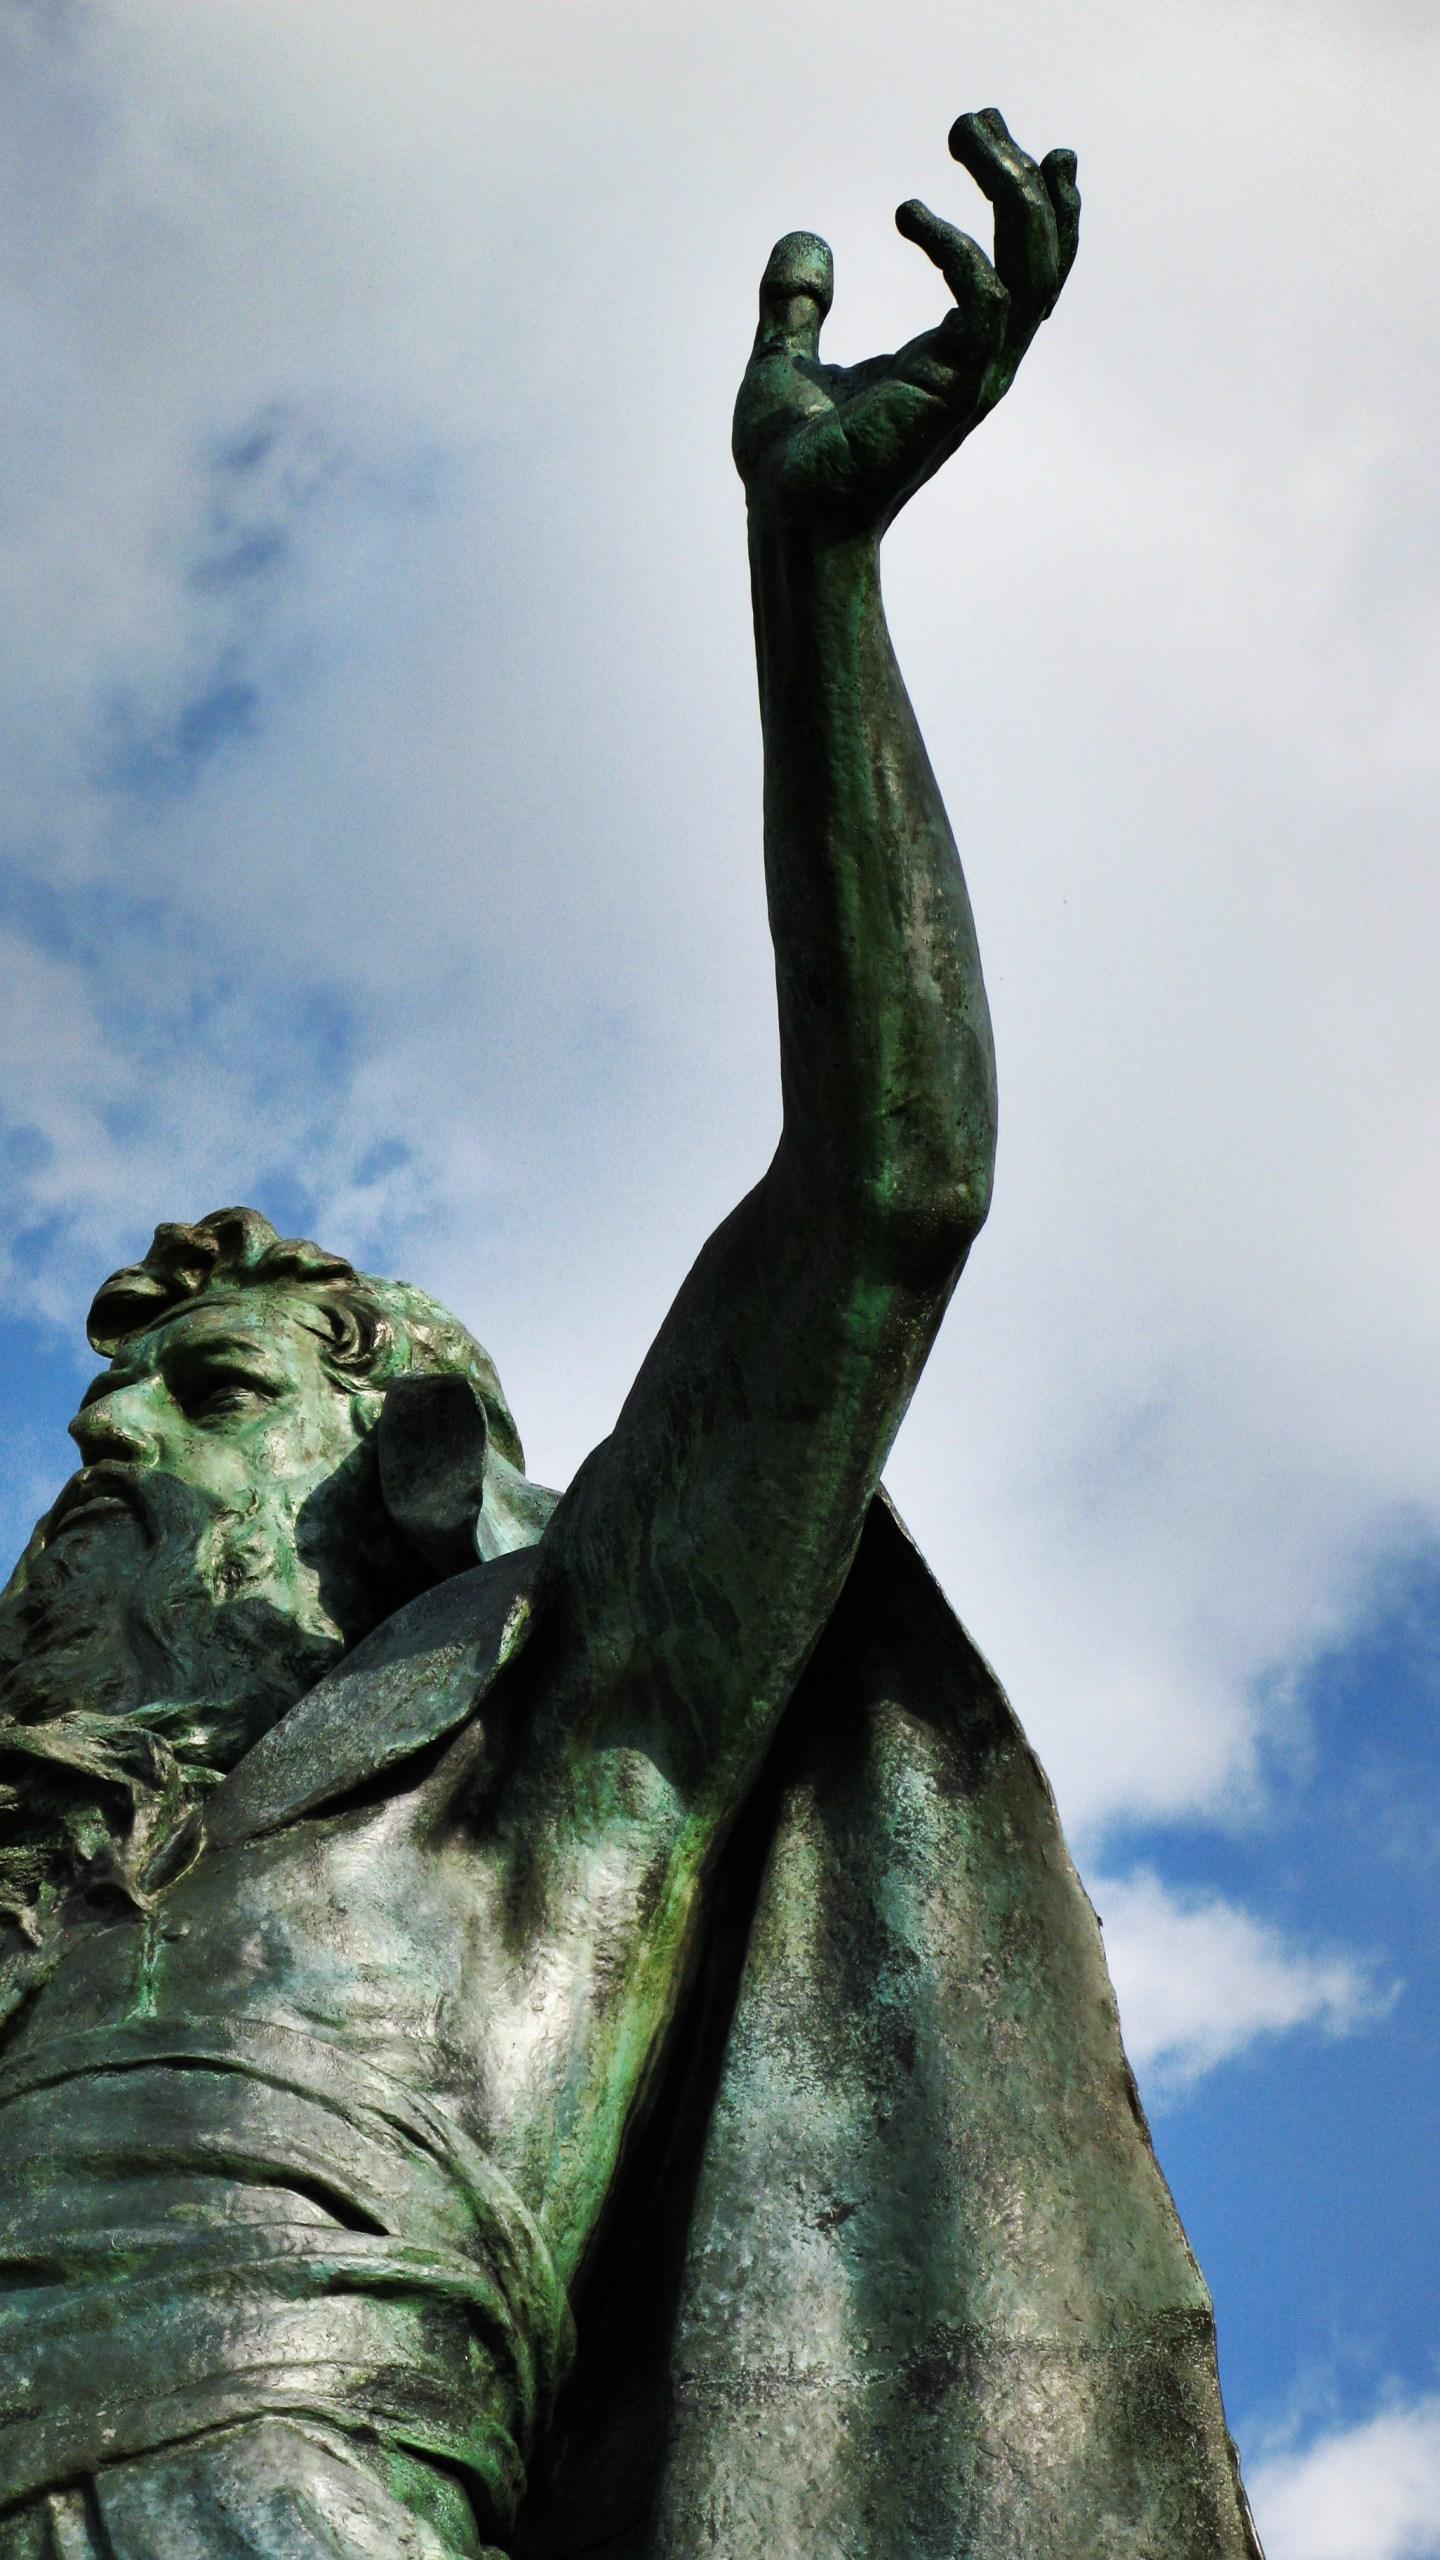 Moses statue in Albany's Washington Park